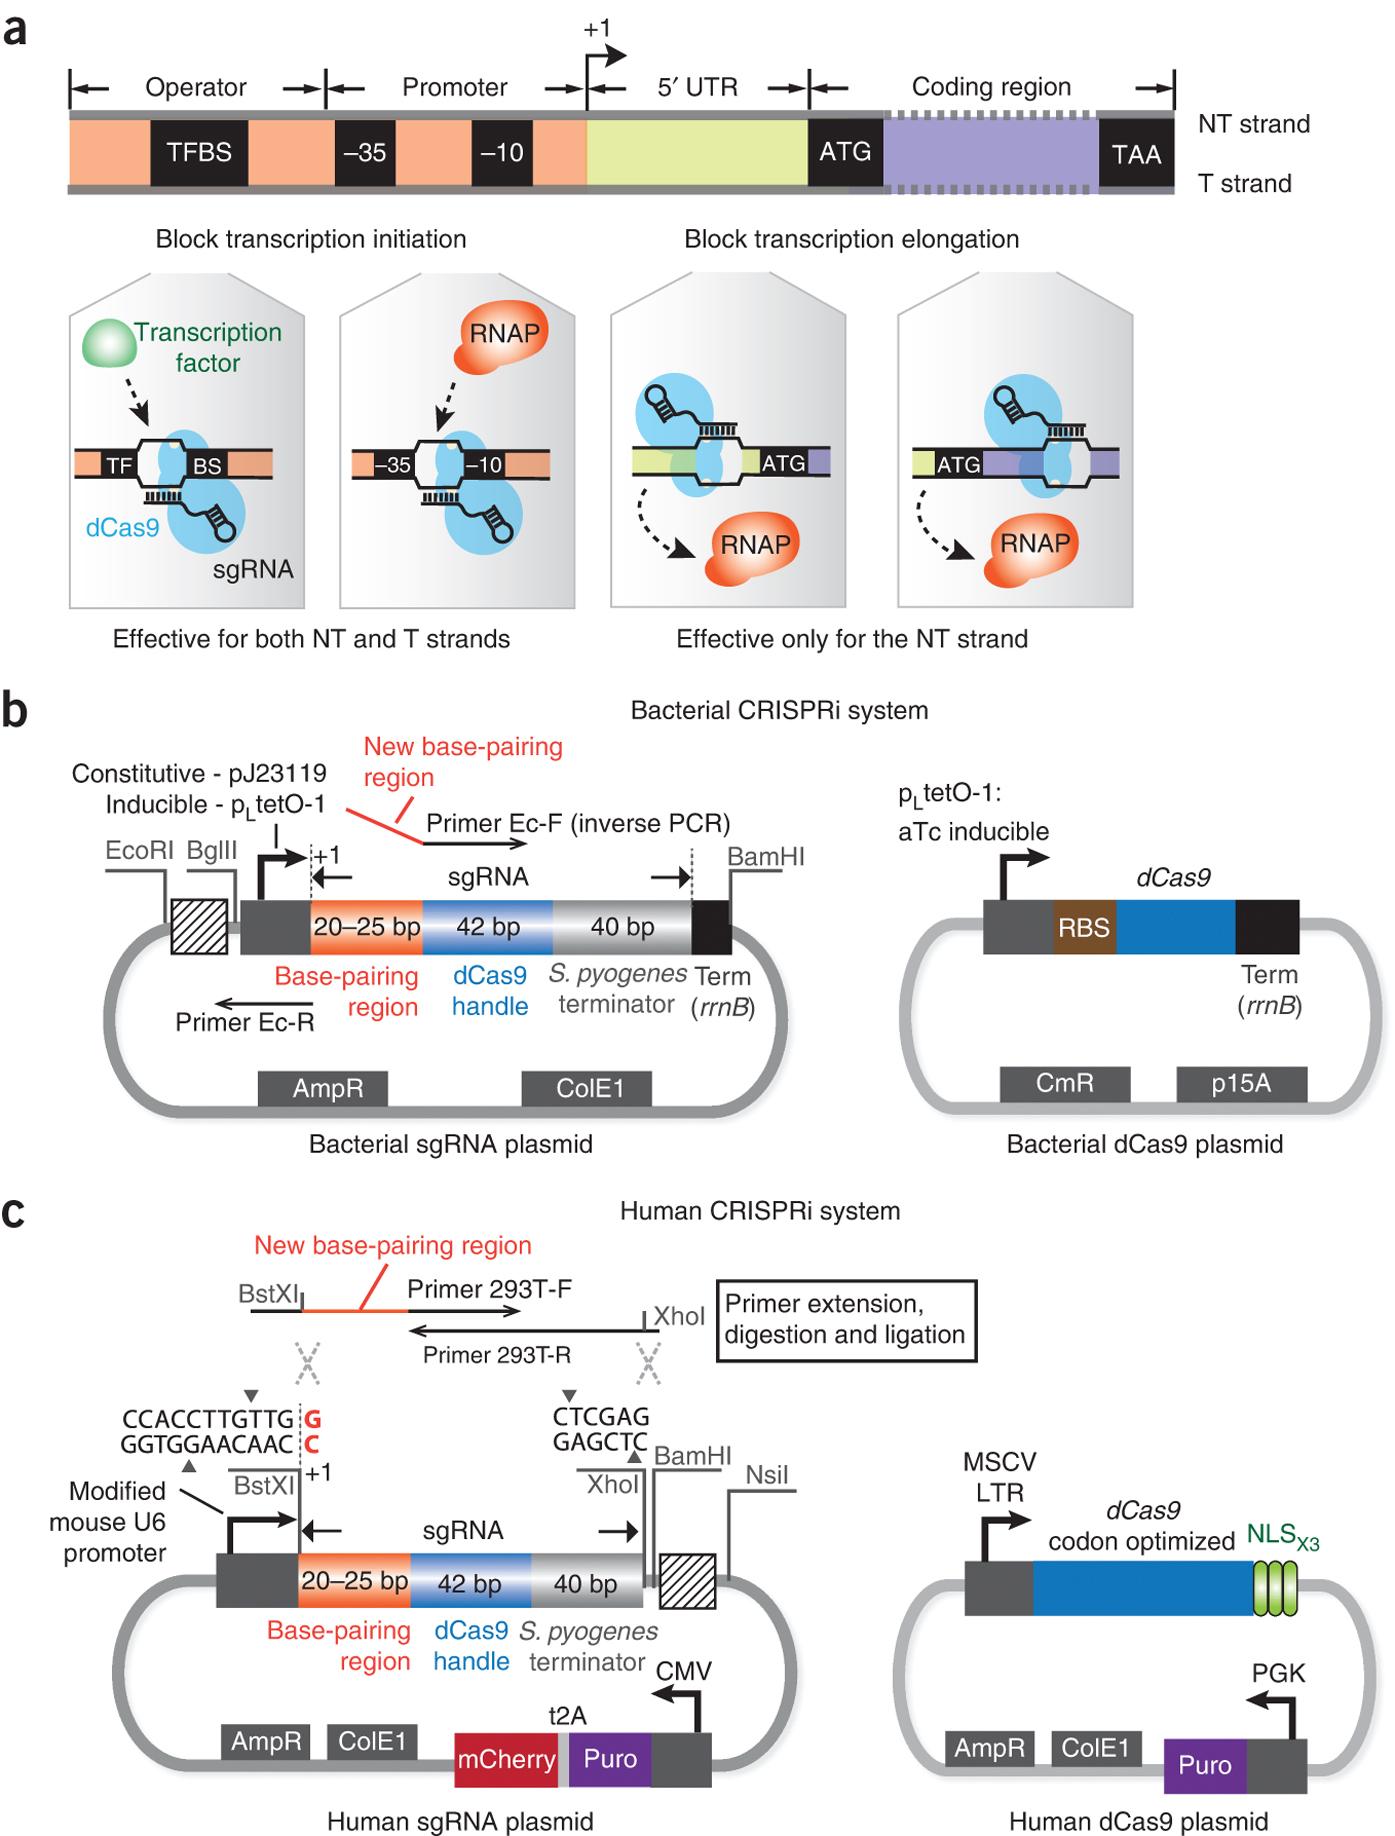 The CRISPRi system for transcription repression in bacteria and human cells.